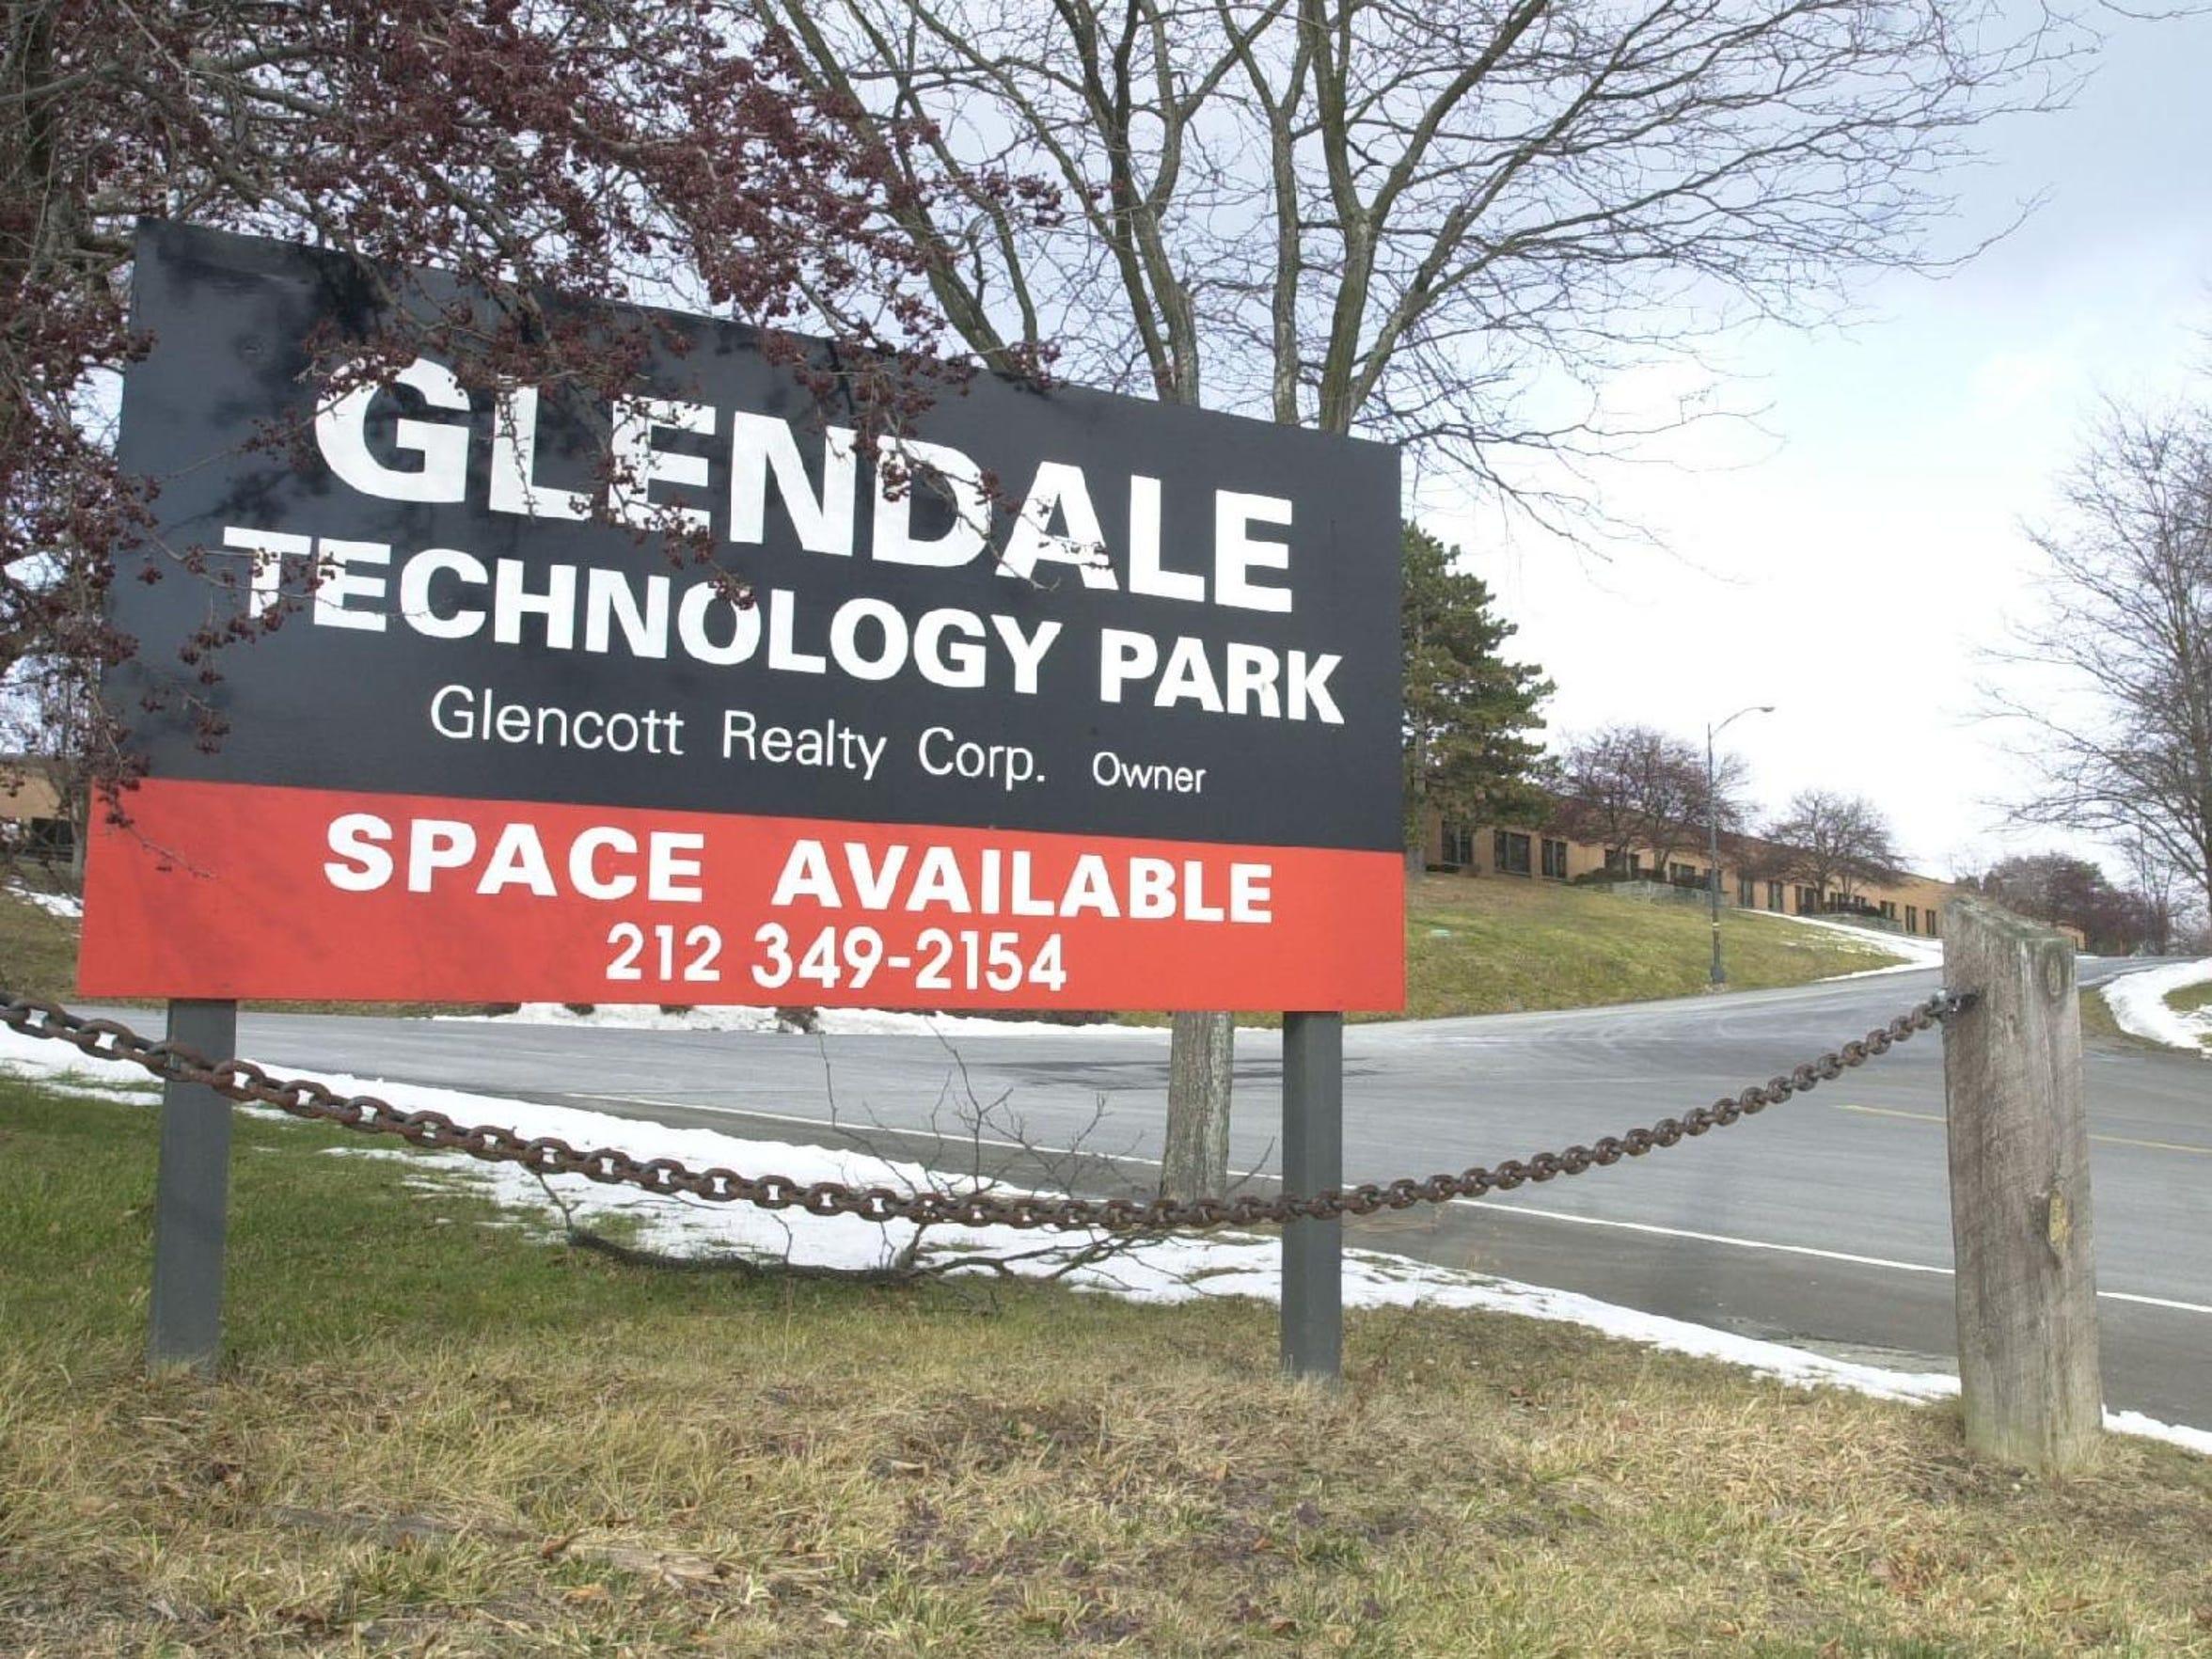 The former IBM Glendale Technology Park near Endicott, New York was sold to a private developer.